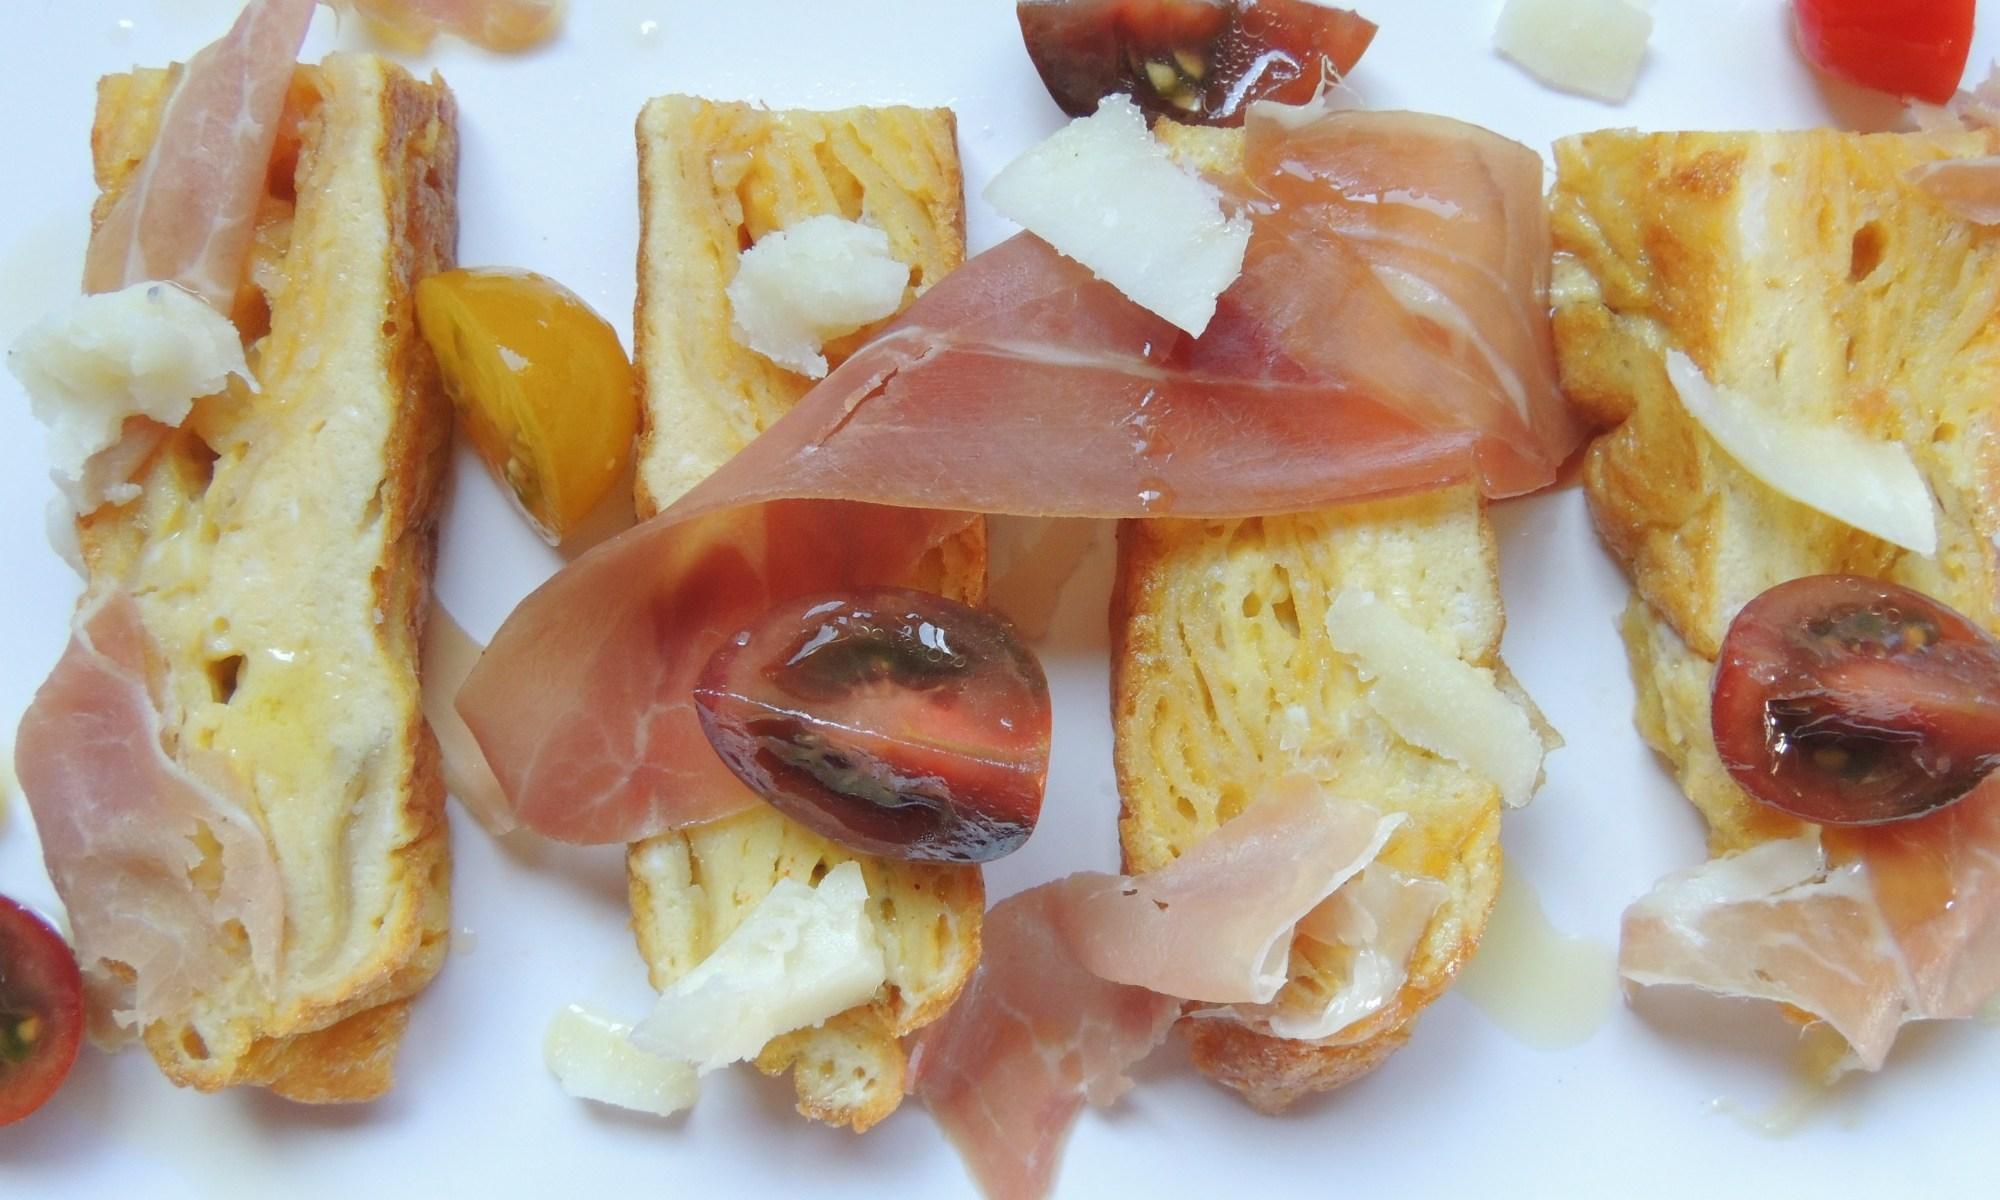 Potato chip omelette with prosciutto, tomato and manchego cheese